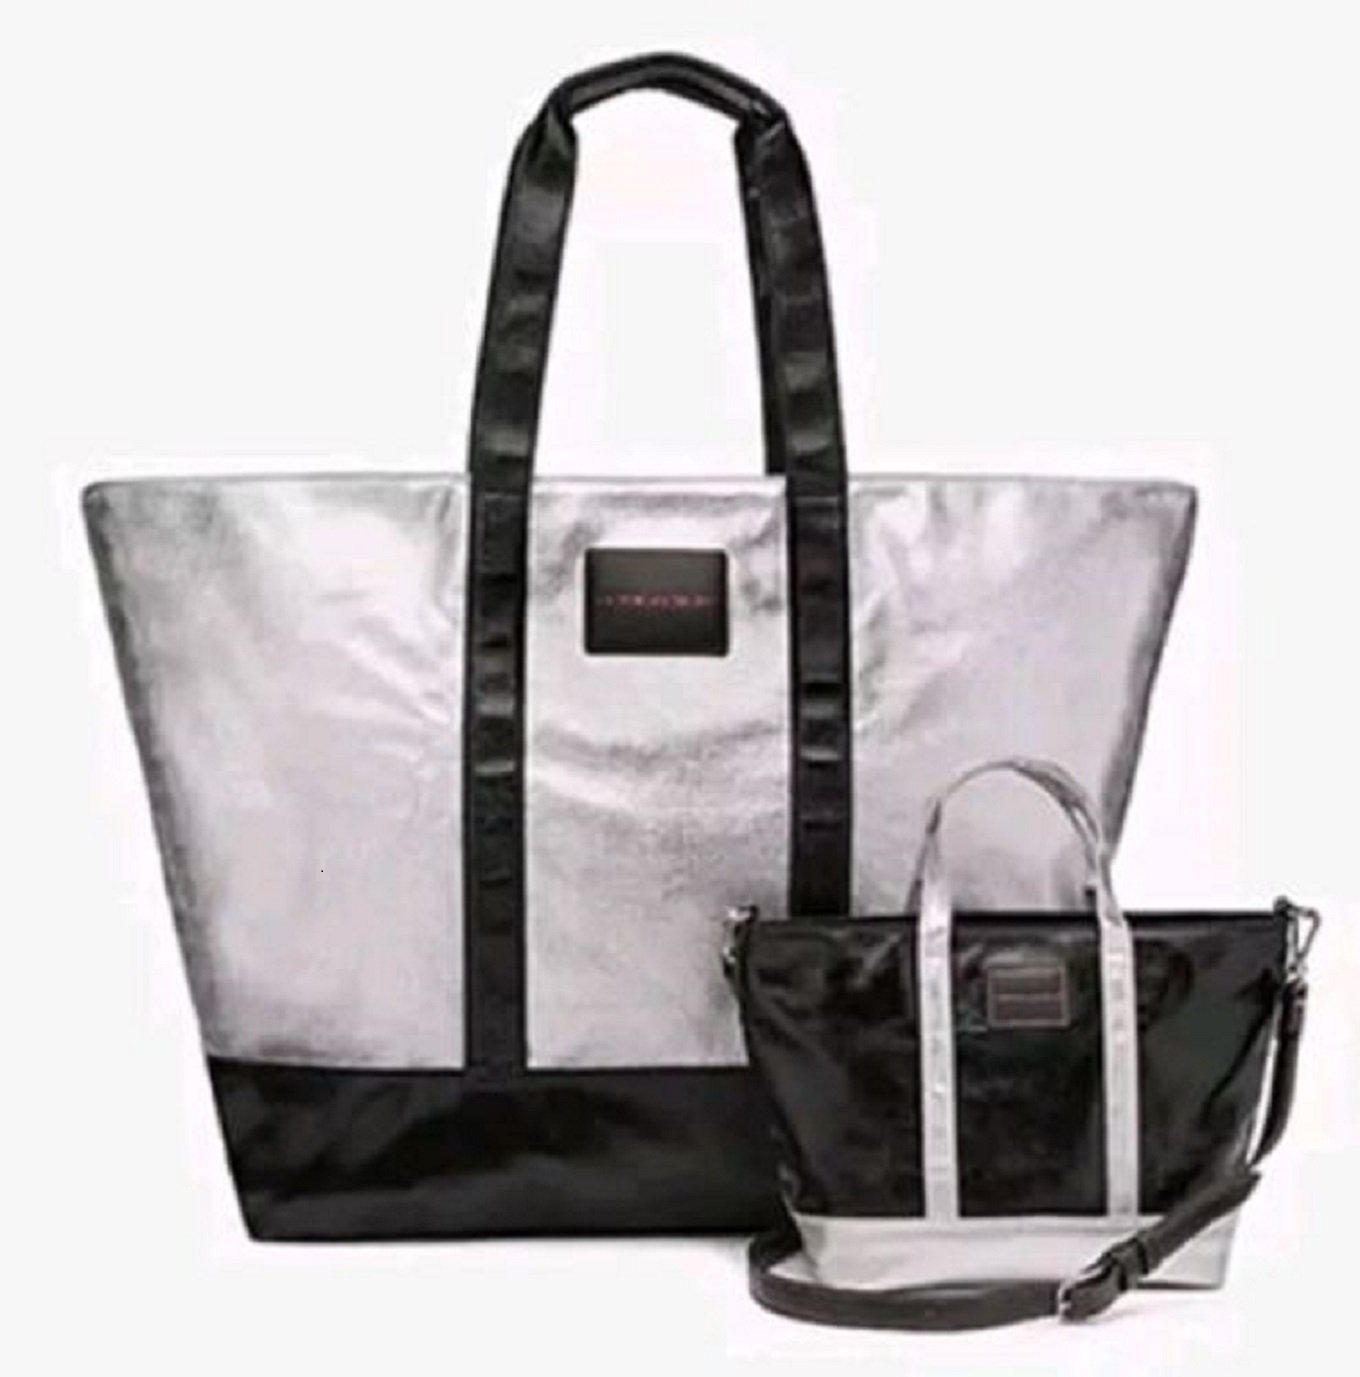 Victoria's Secret Limed Edition Metallic Silver Weekender Tote Bag & Crossbody Duo